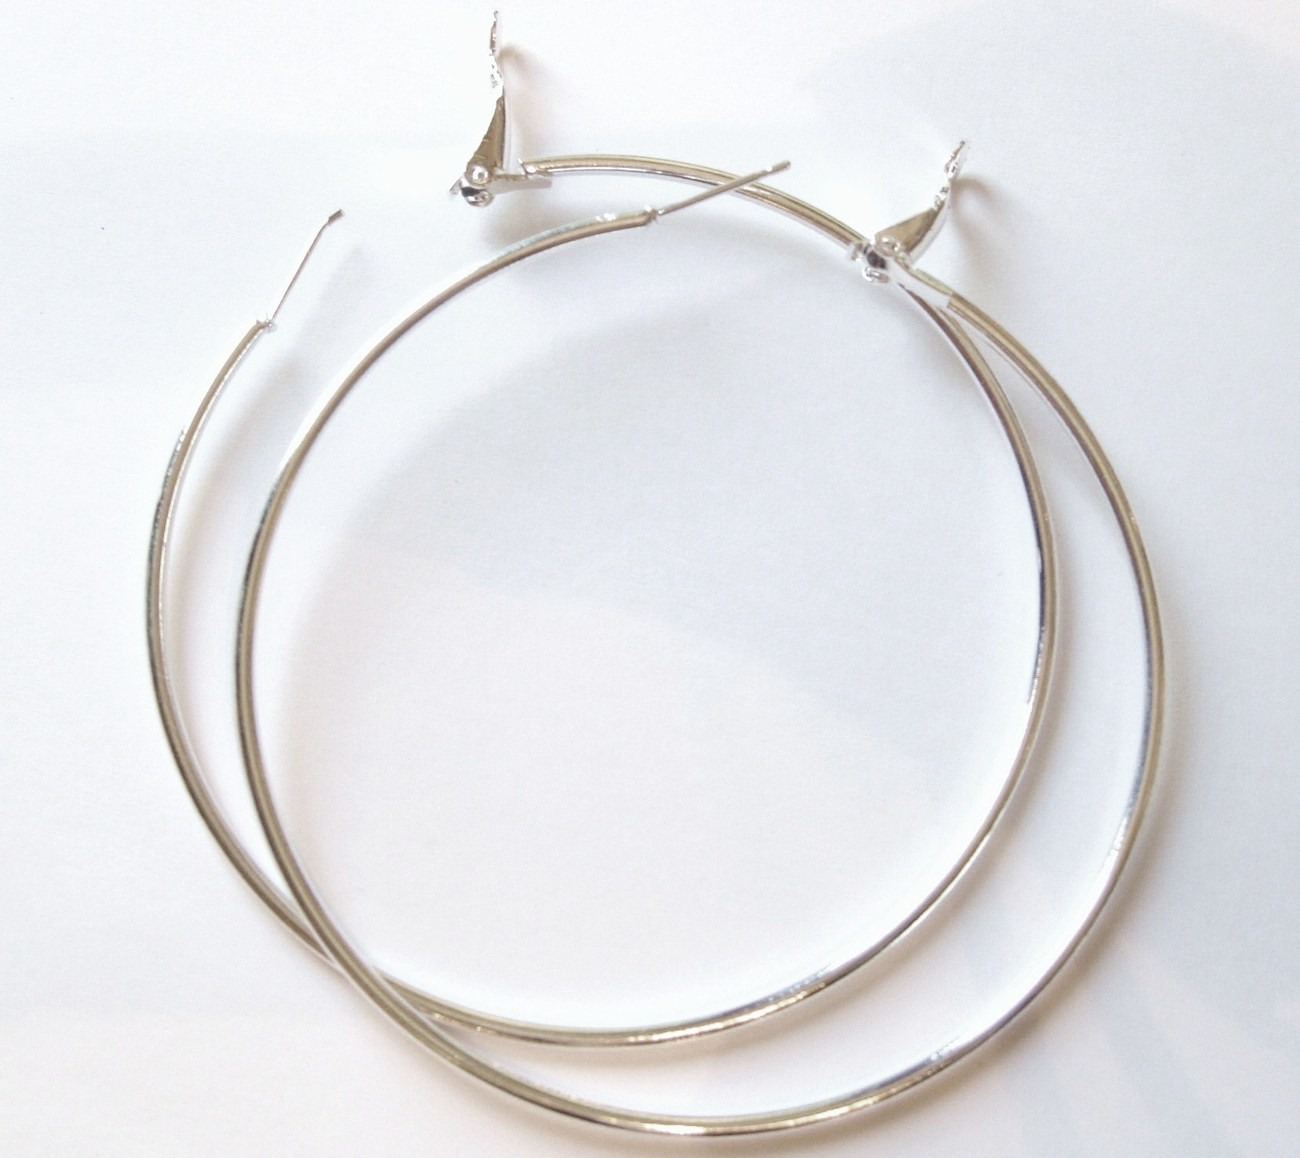 Ea86 extra large slver hoop 2.75 inch